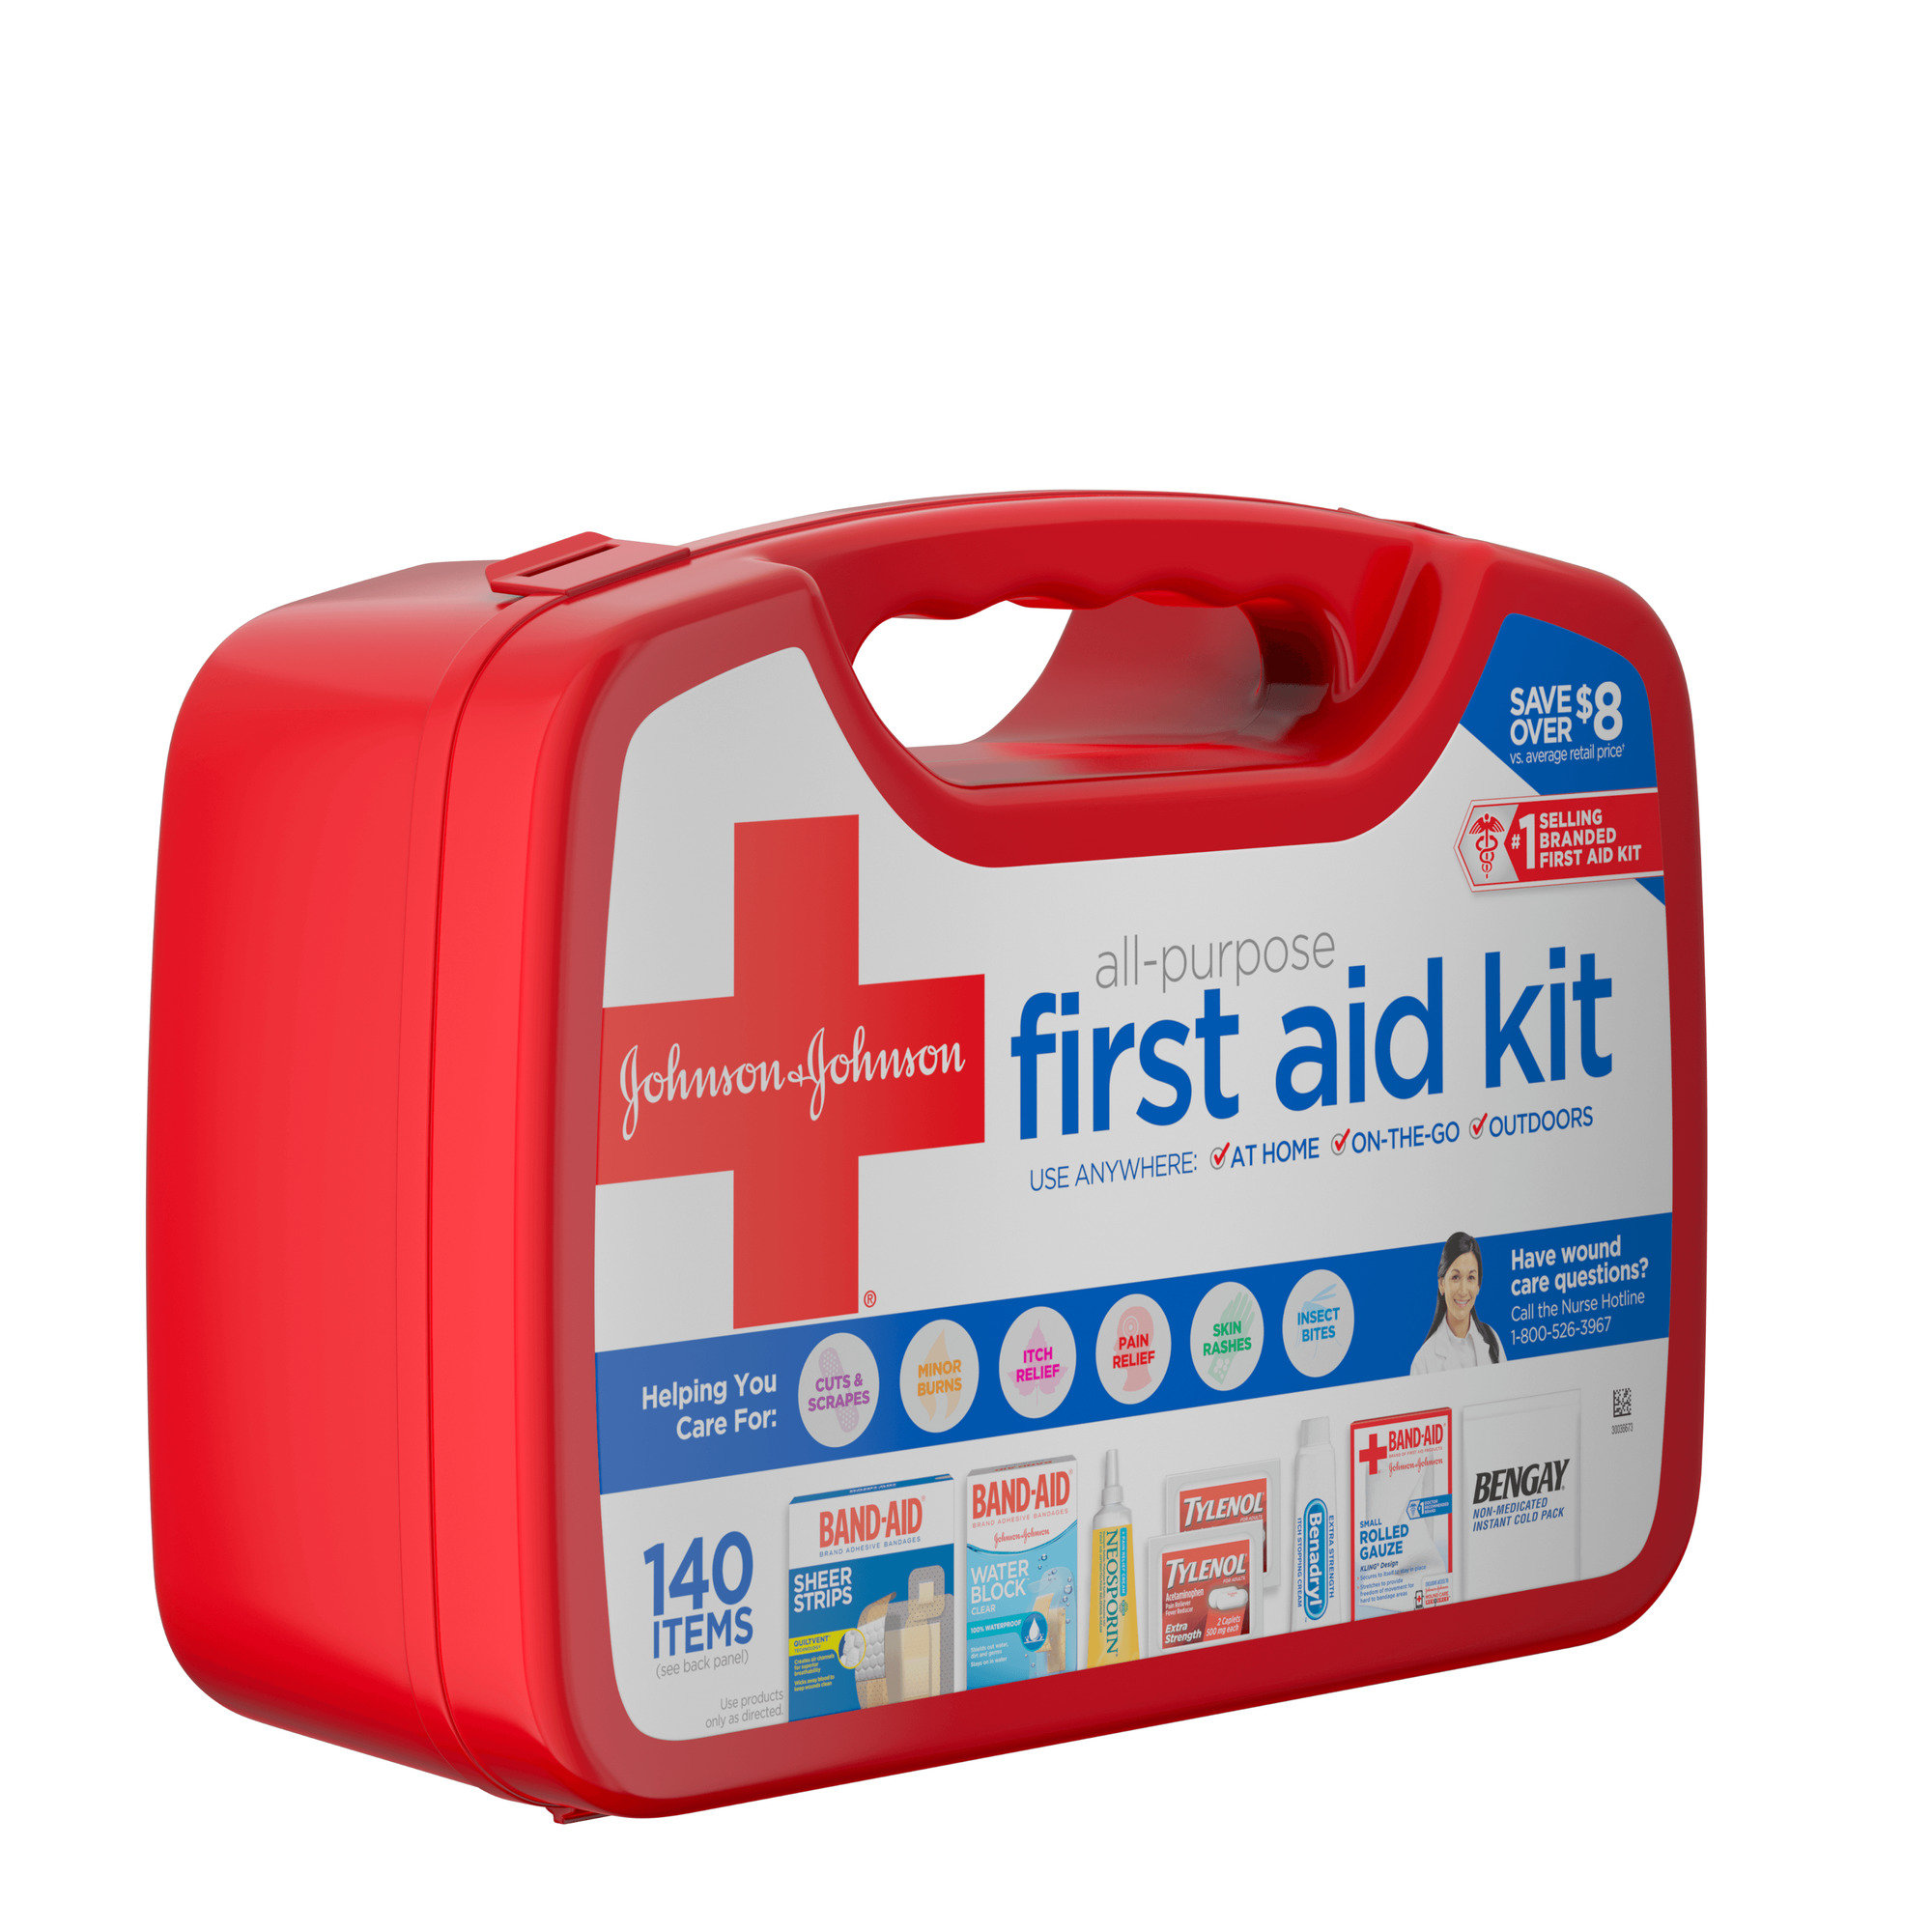 1cc6fcba56c7 Johnson & Johnson Red Cross® All Purpose First Aid Kit, 140 Items